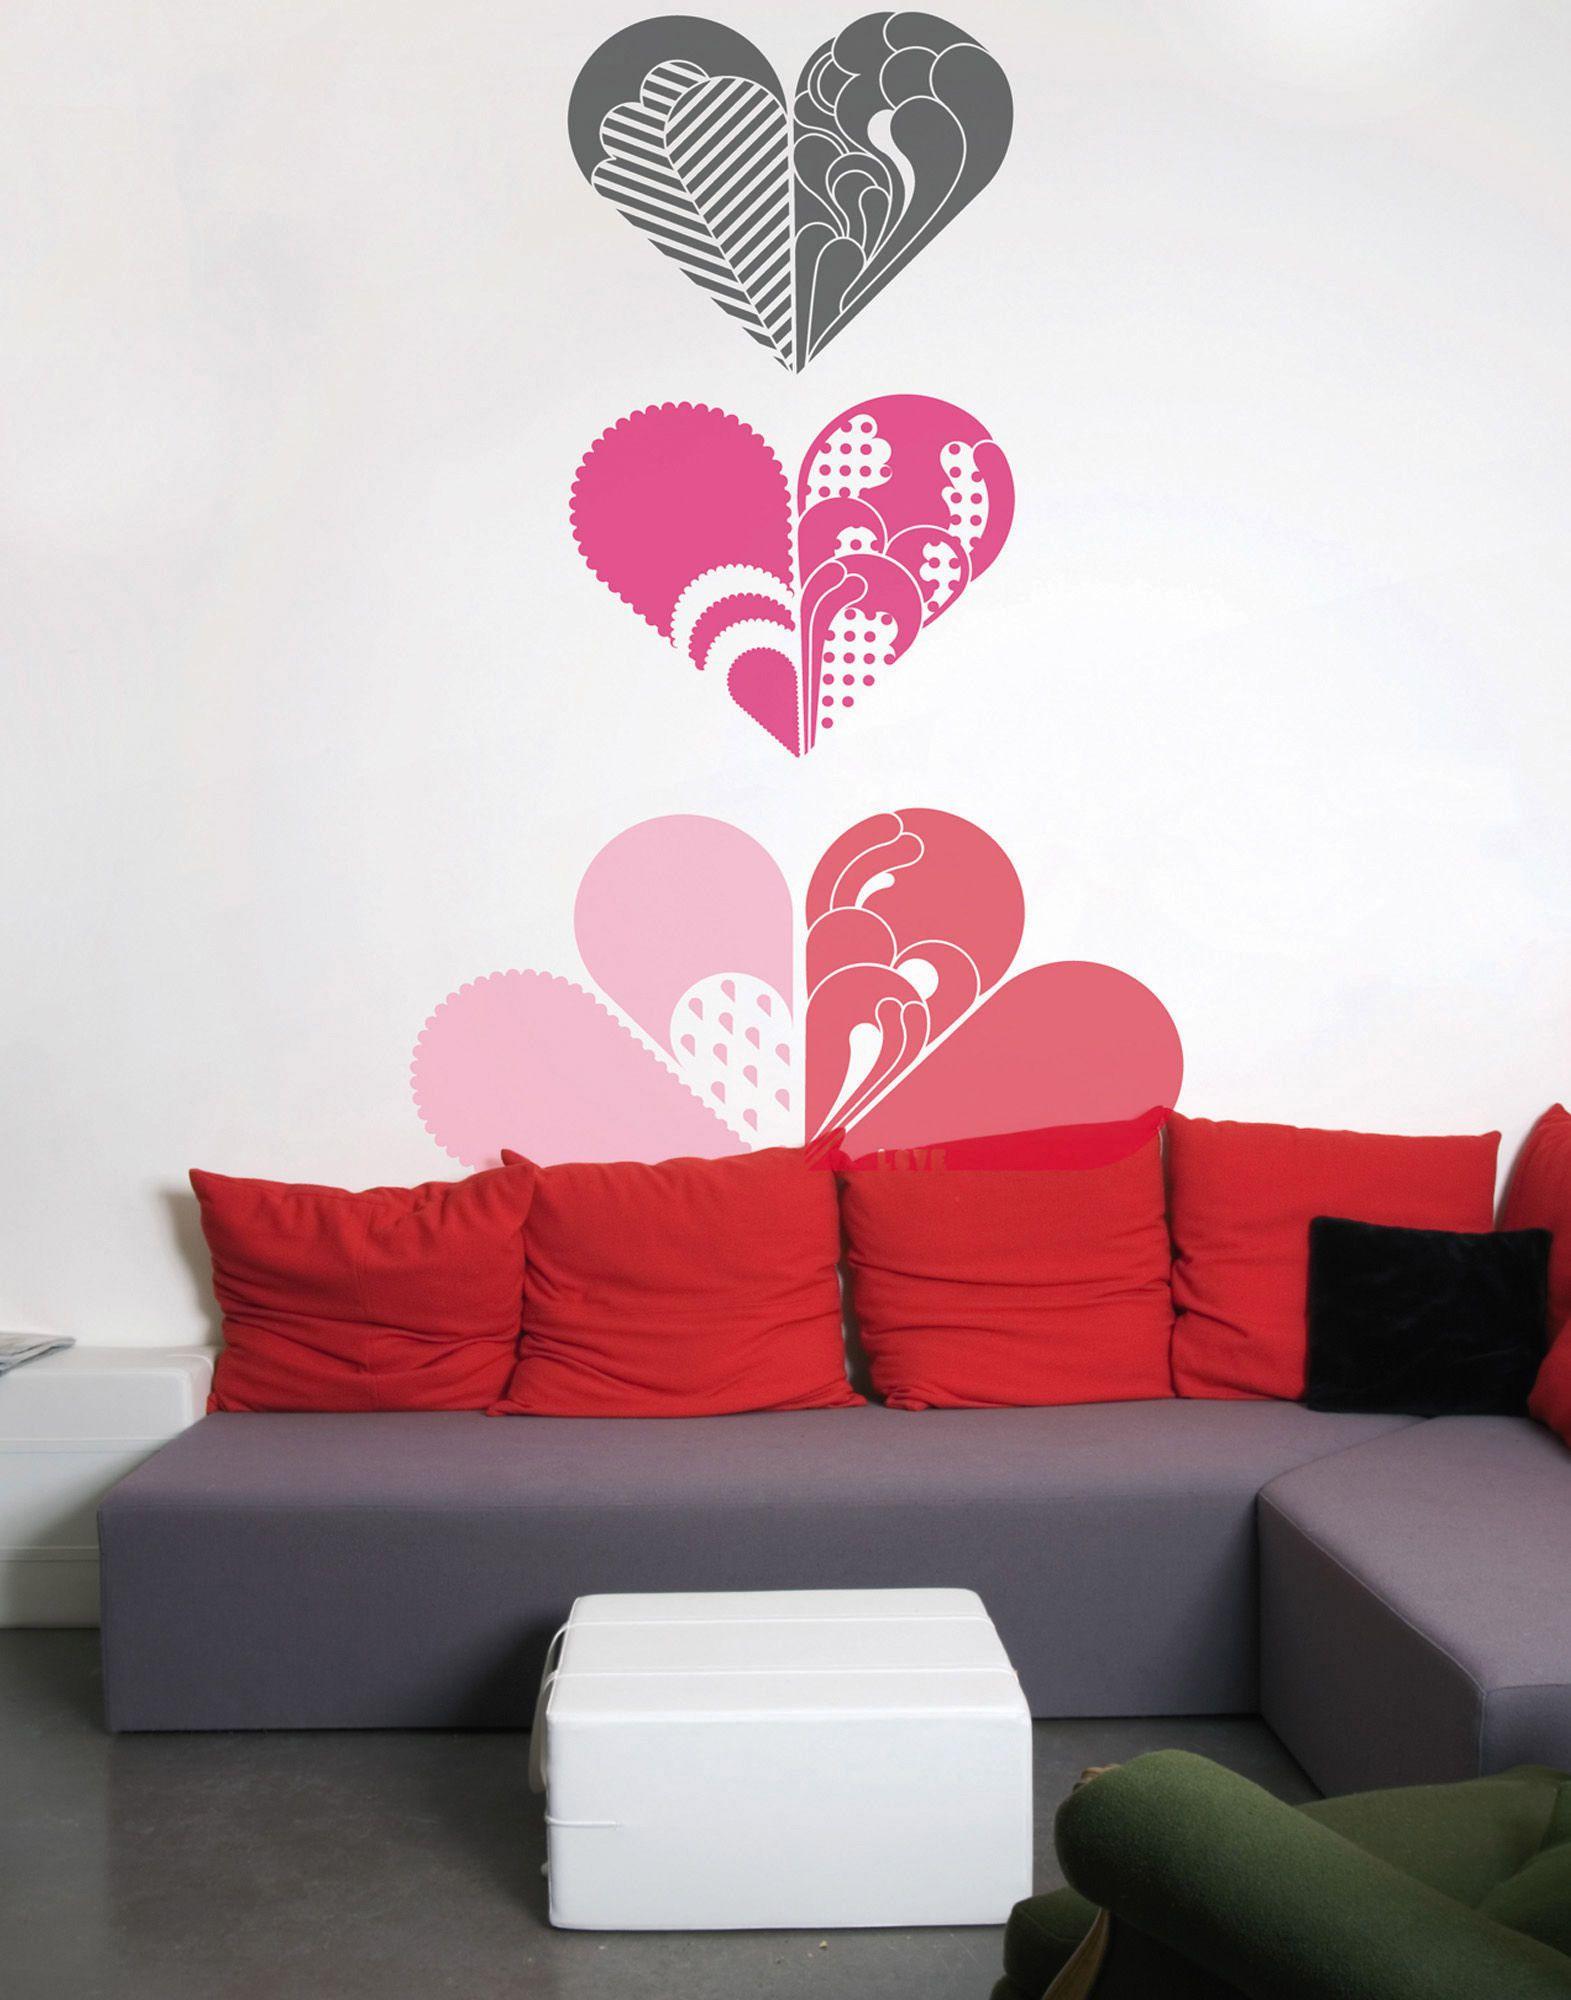 YOOX.COM(ユークス)《セール開催中》DOMESTIC Unisex デコレーション (-) ビニール Love pink